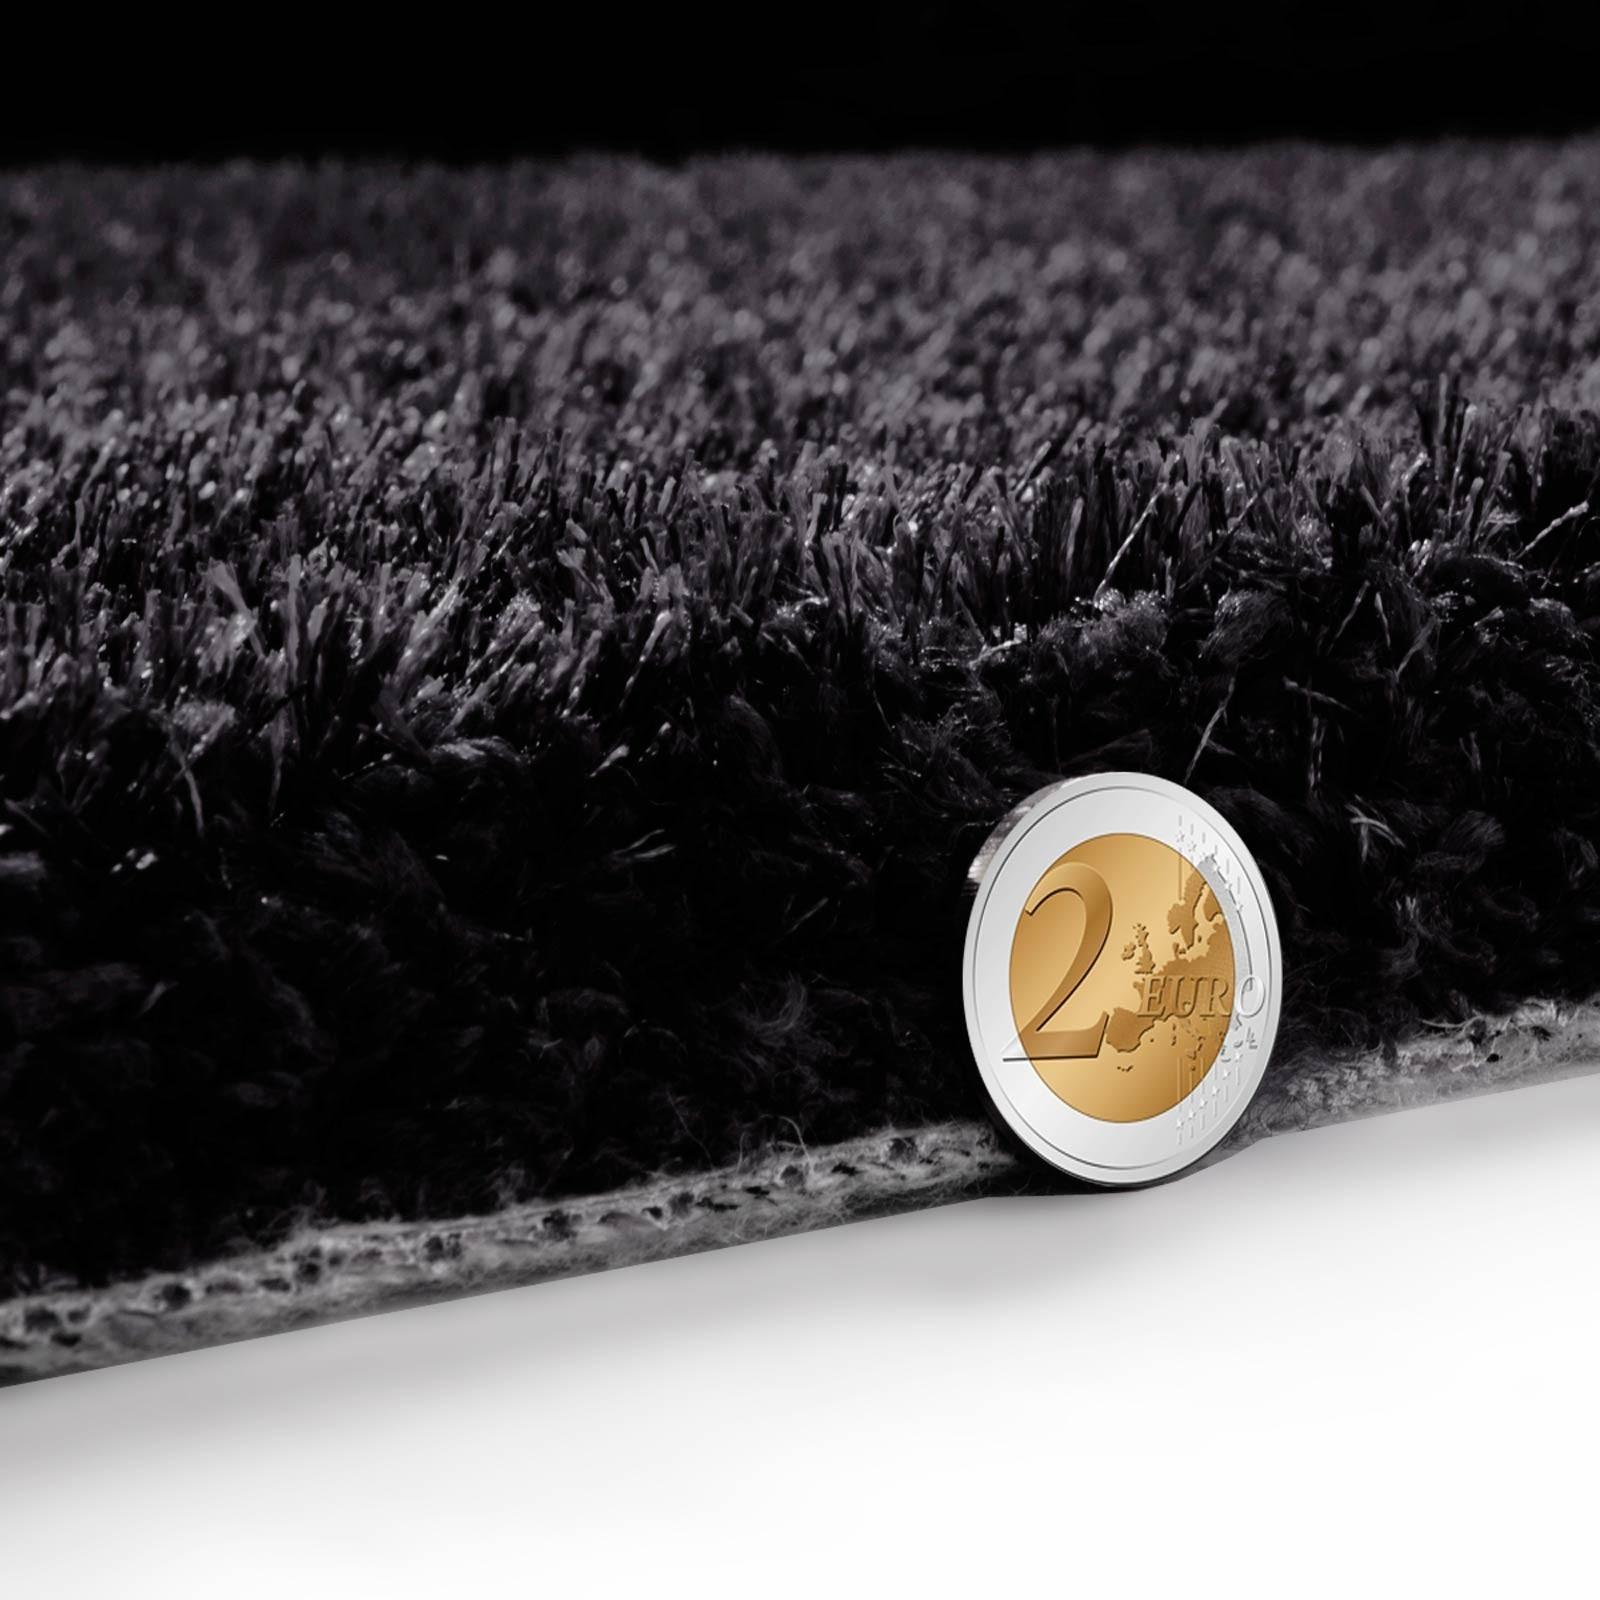 Shaggy Deep Pile Carpet Floor Rug Fully Customisable Intended For Deep Shag Pile Carpets (Image 12 of 15)